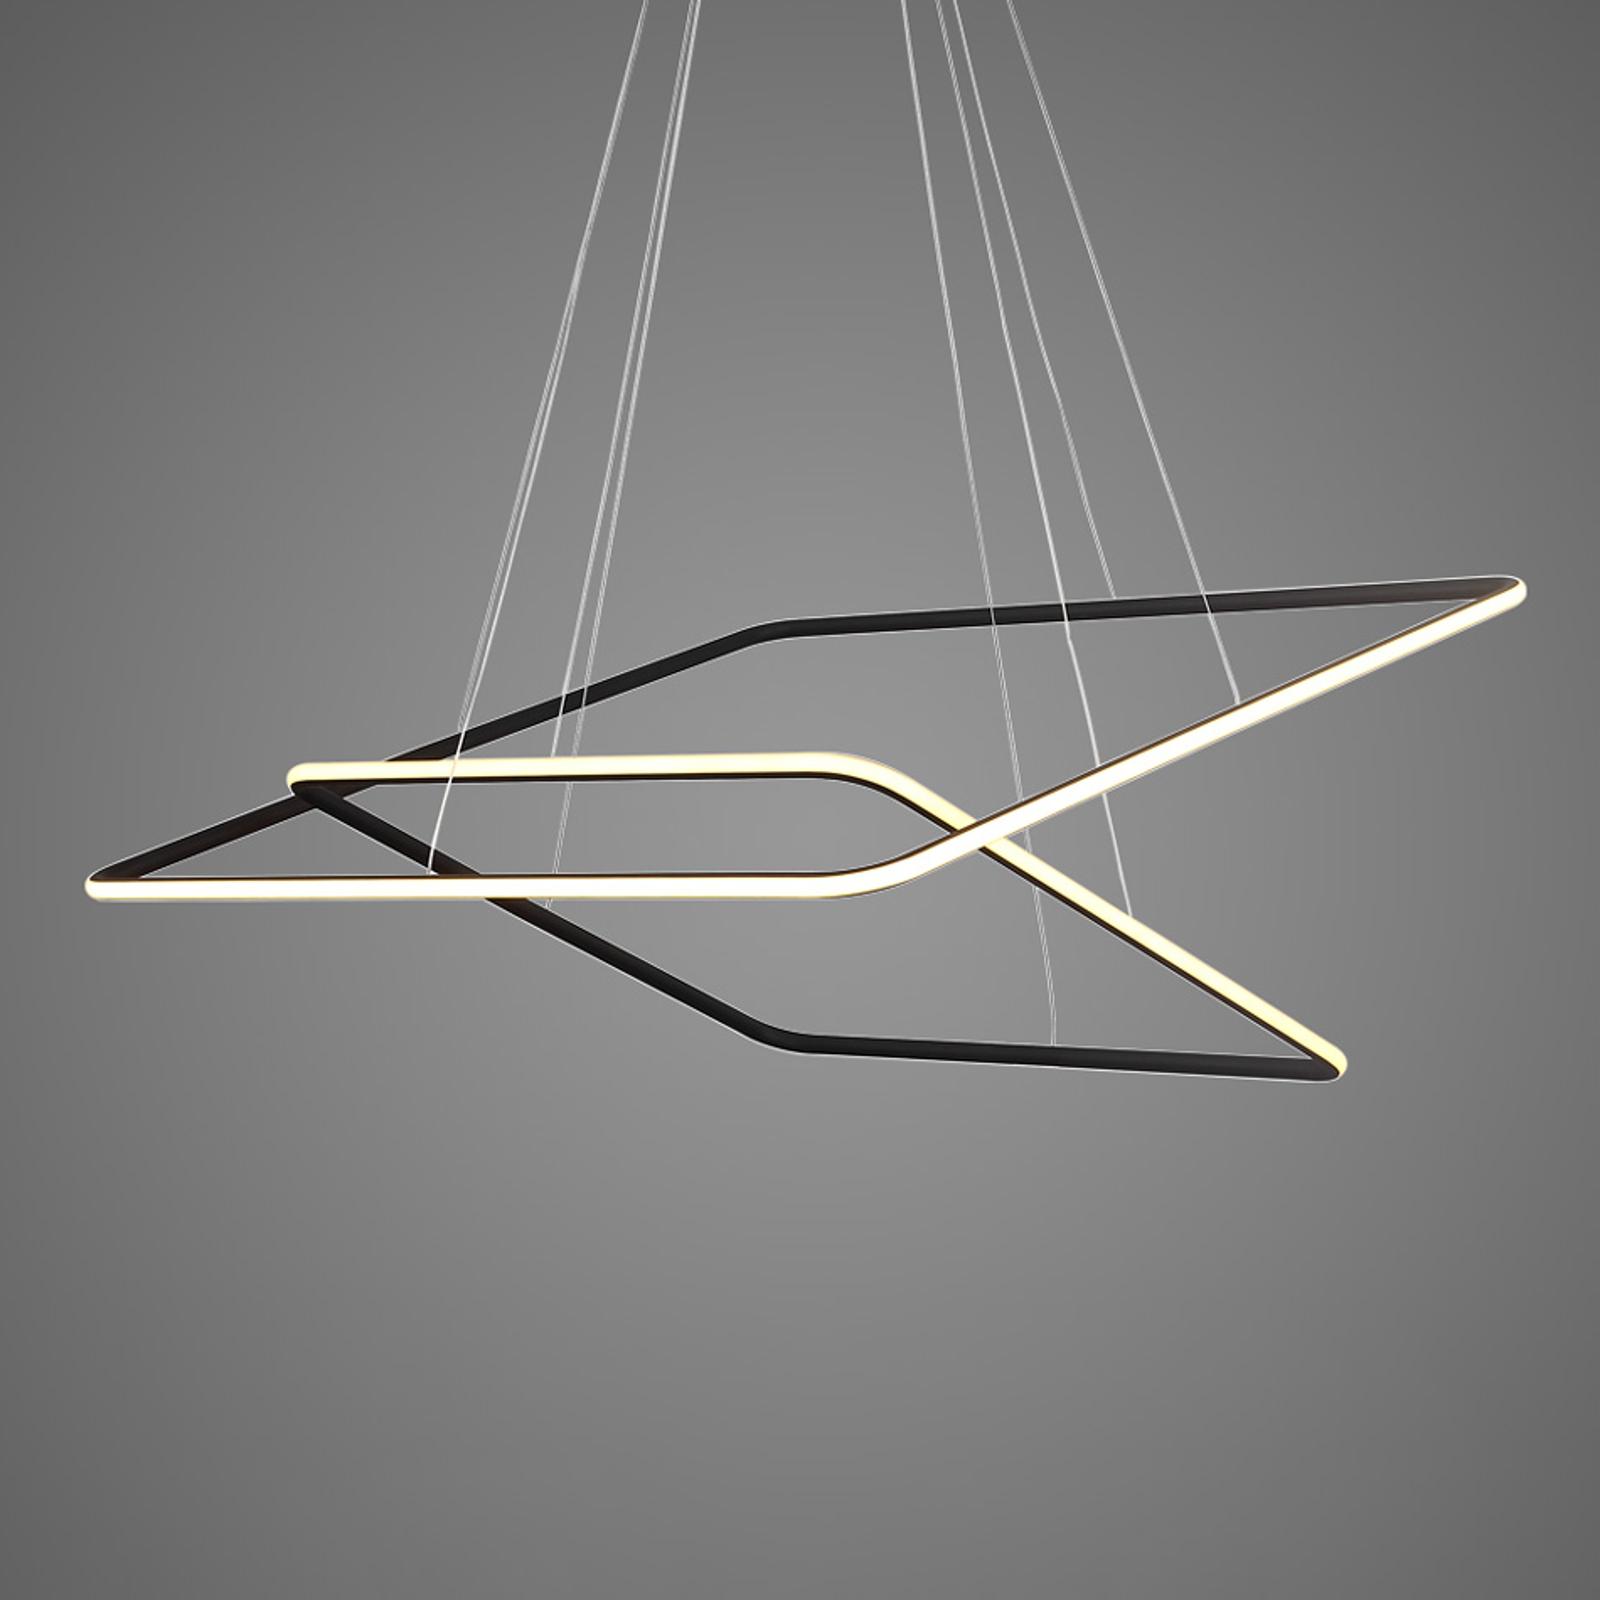 Lampa wisząca LA077 2-pkt. 80x80cm czarna 3000K